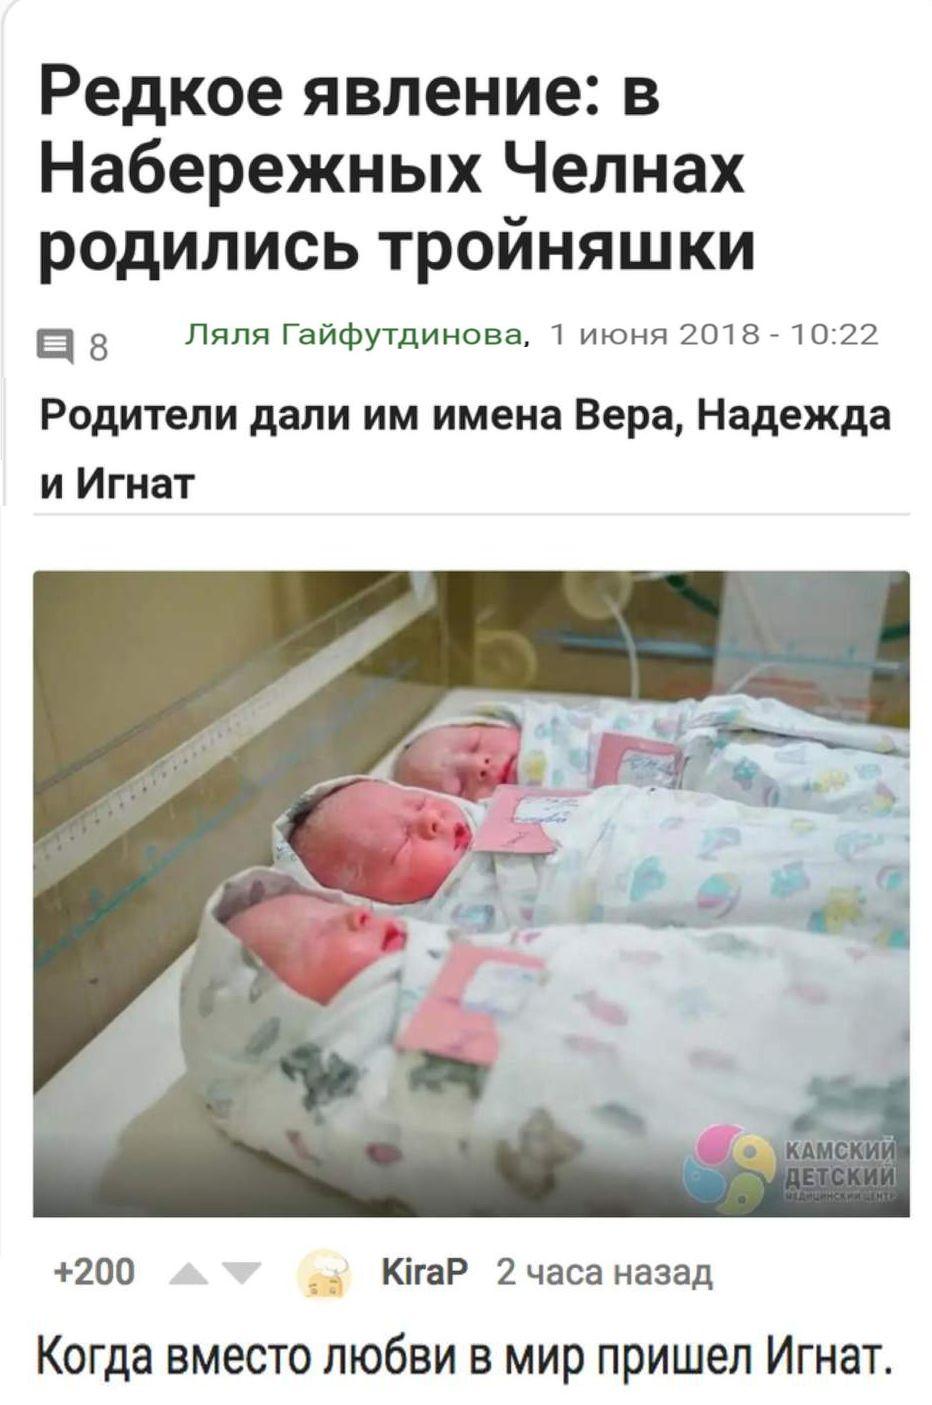 http://s00.yaplakal.com/pics/pics_original/9/2/4/11600429.jpg